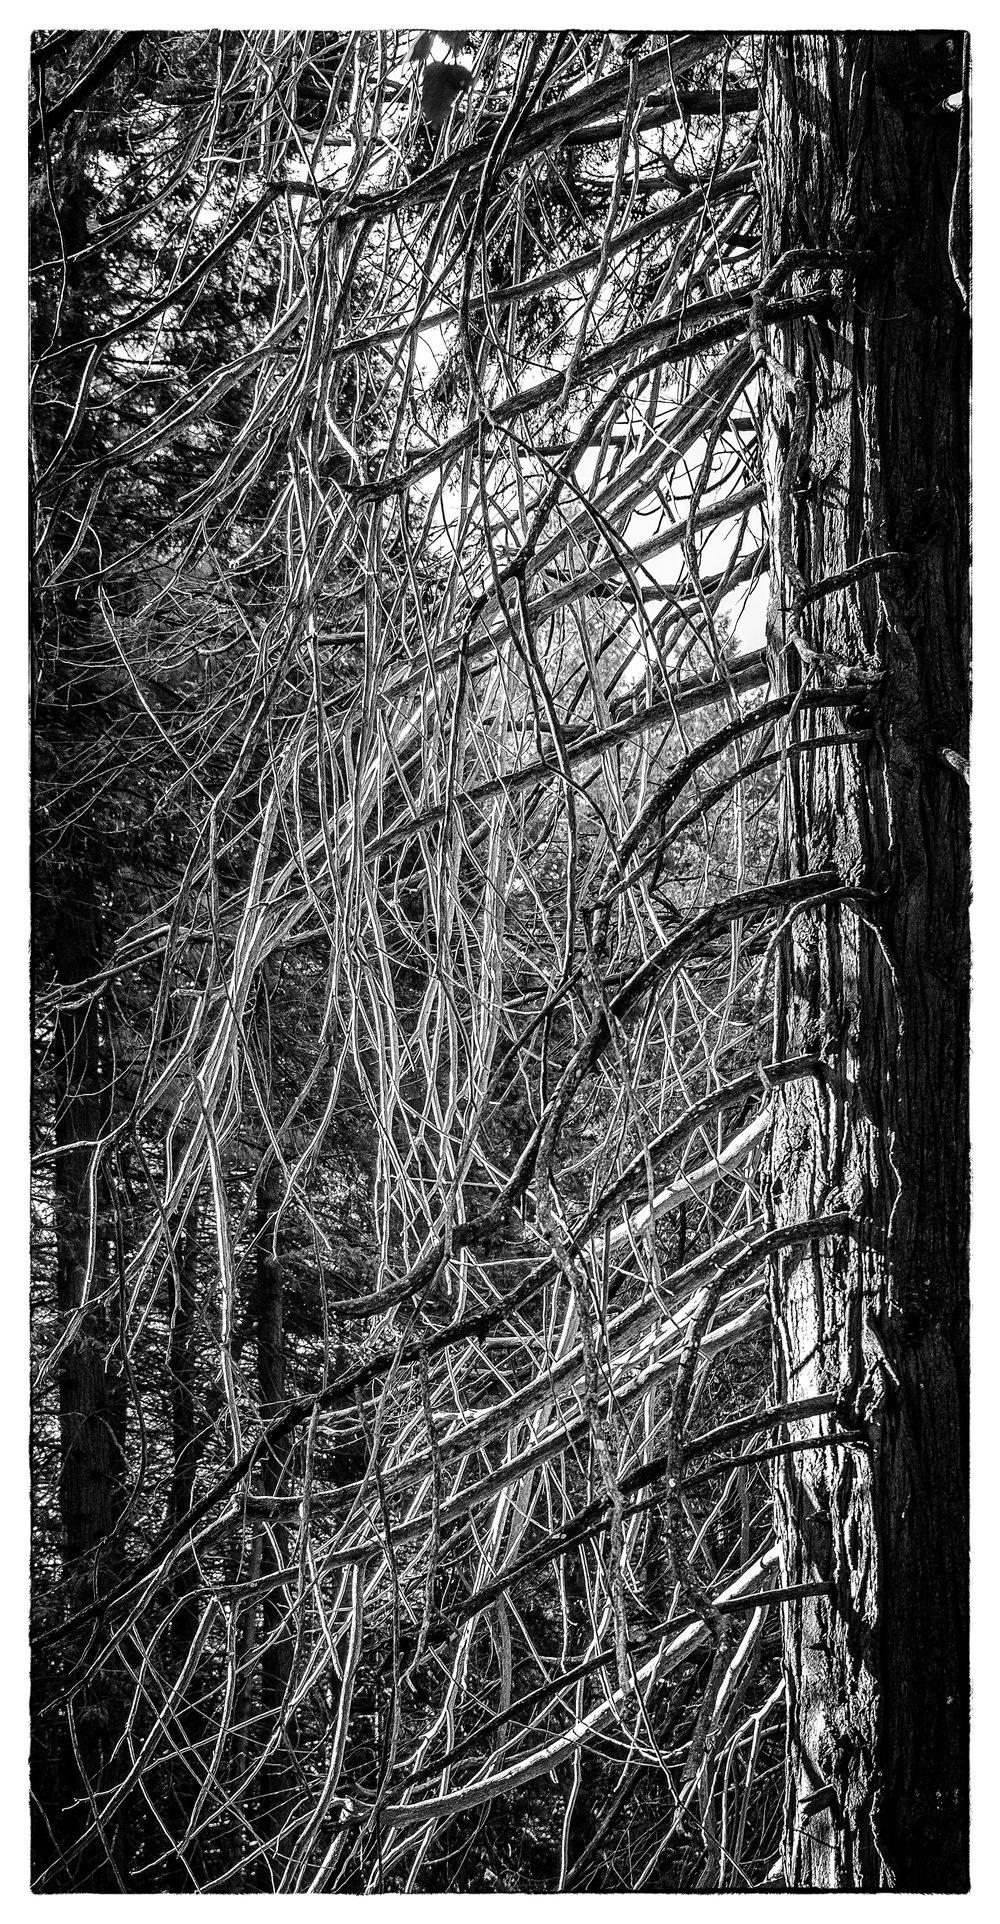 NAPA-Yosemite-67.jpg